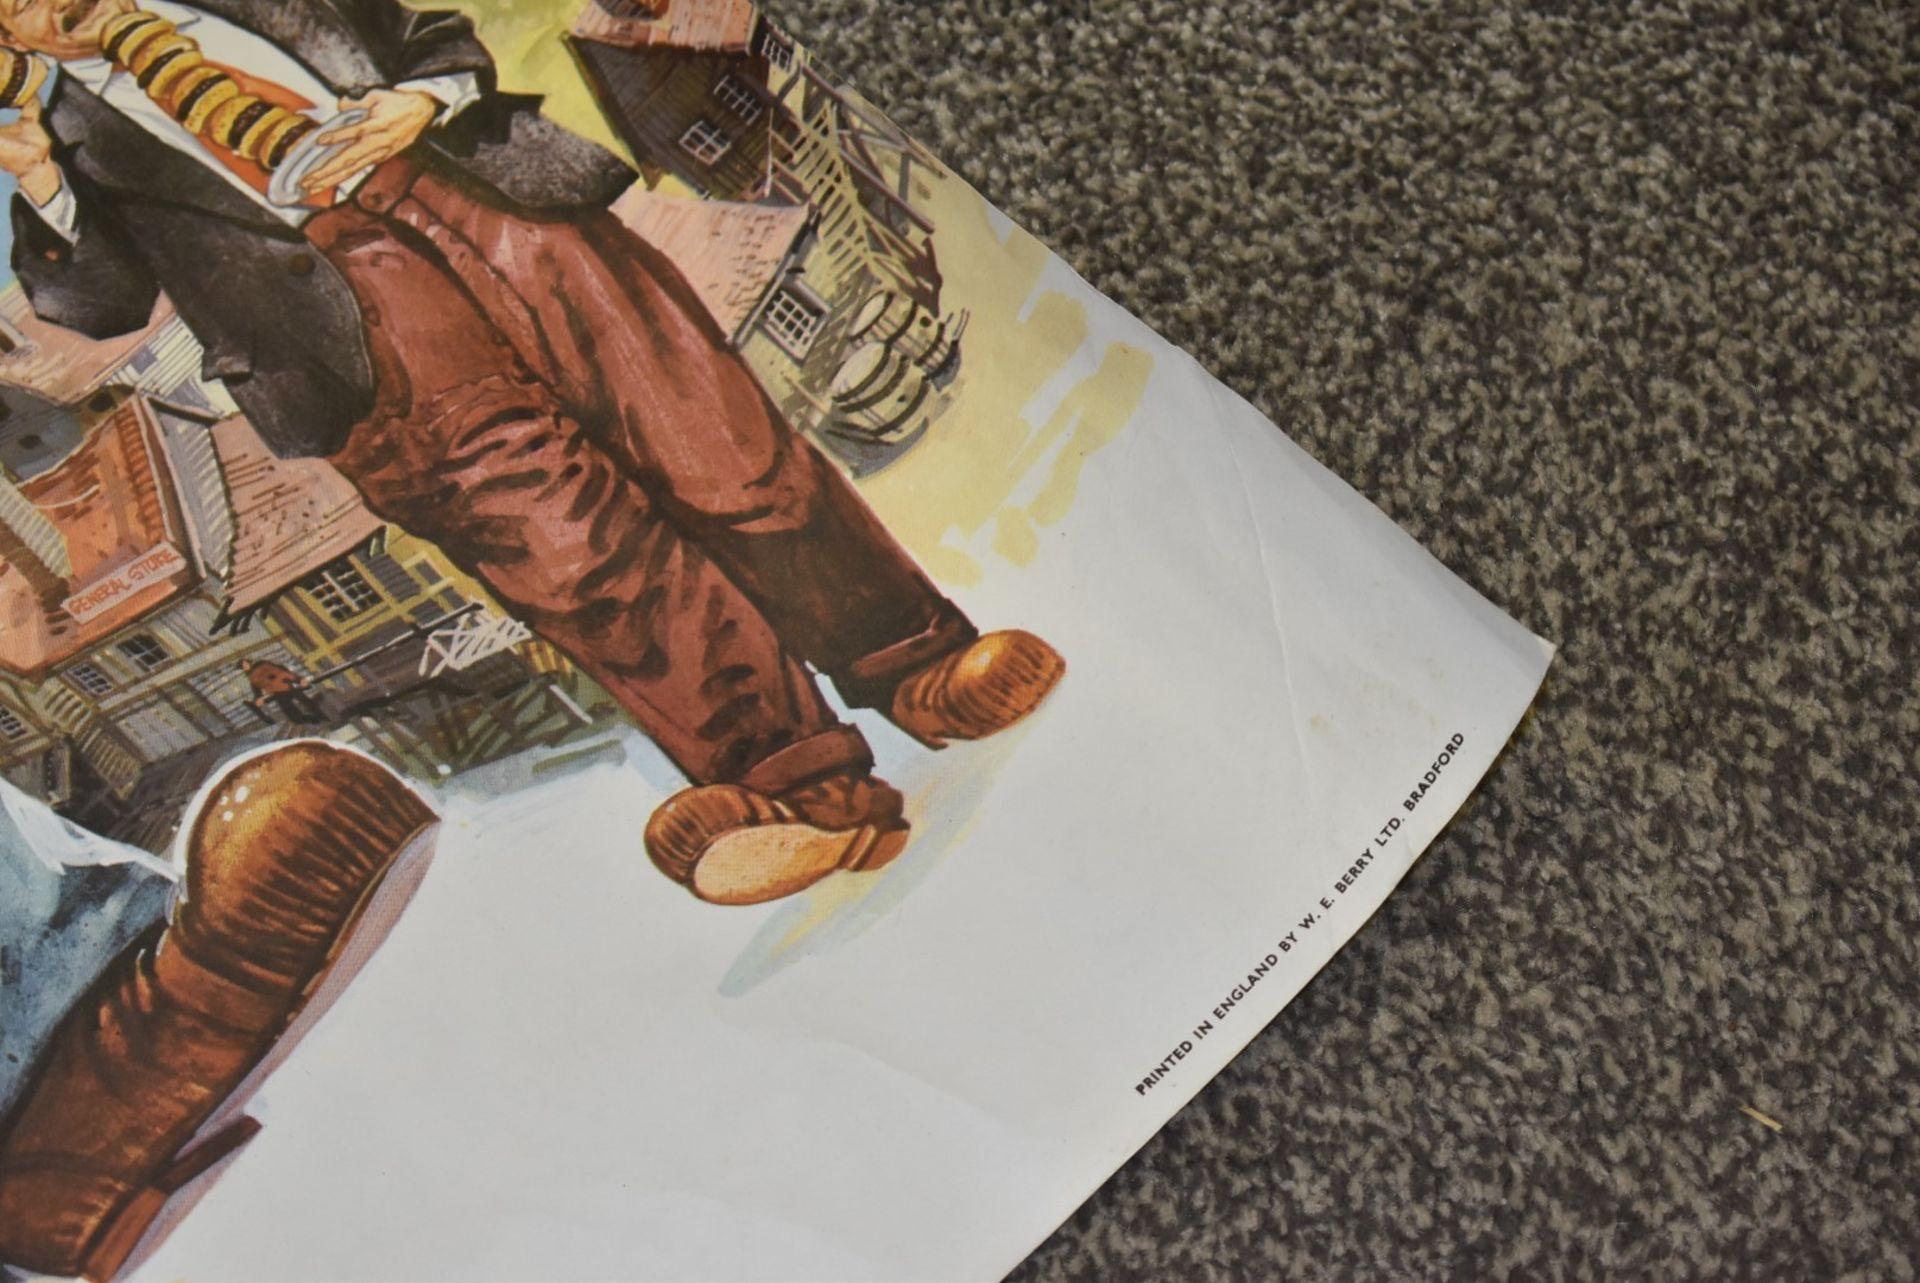 Lot 4058 - 1 x Quad Movie Poster - POPEYE - Starring Robin Williams and Shelley Duvall - 1980 Film - Walt